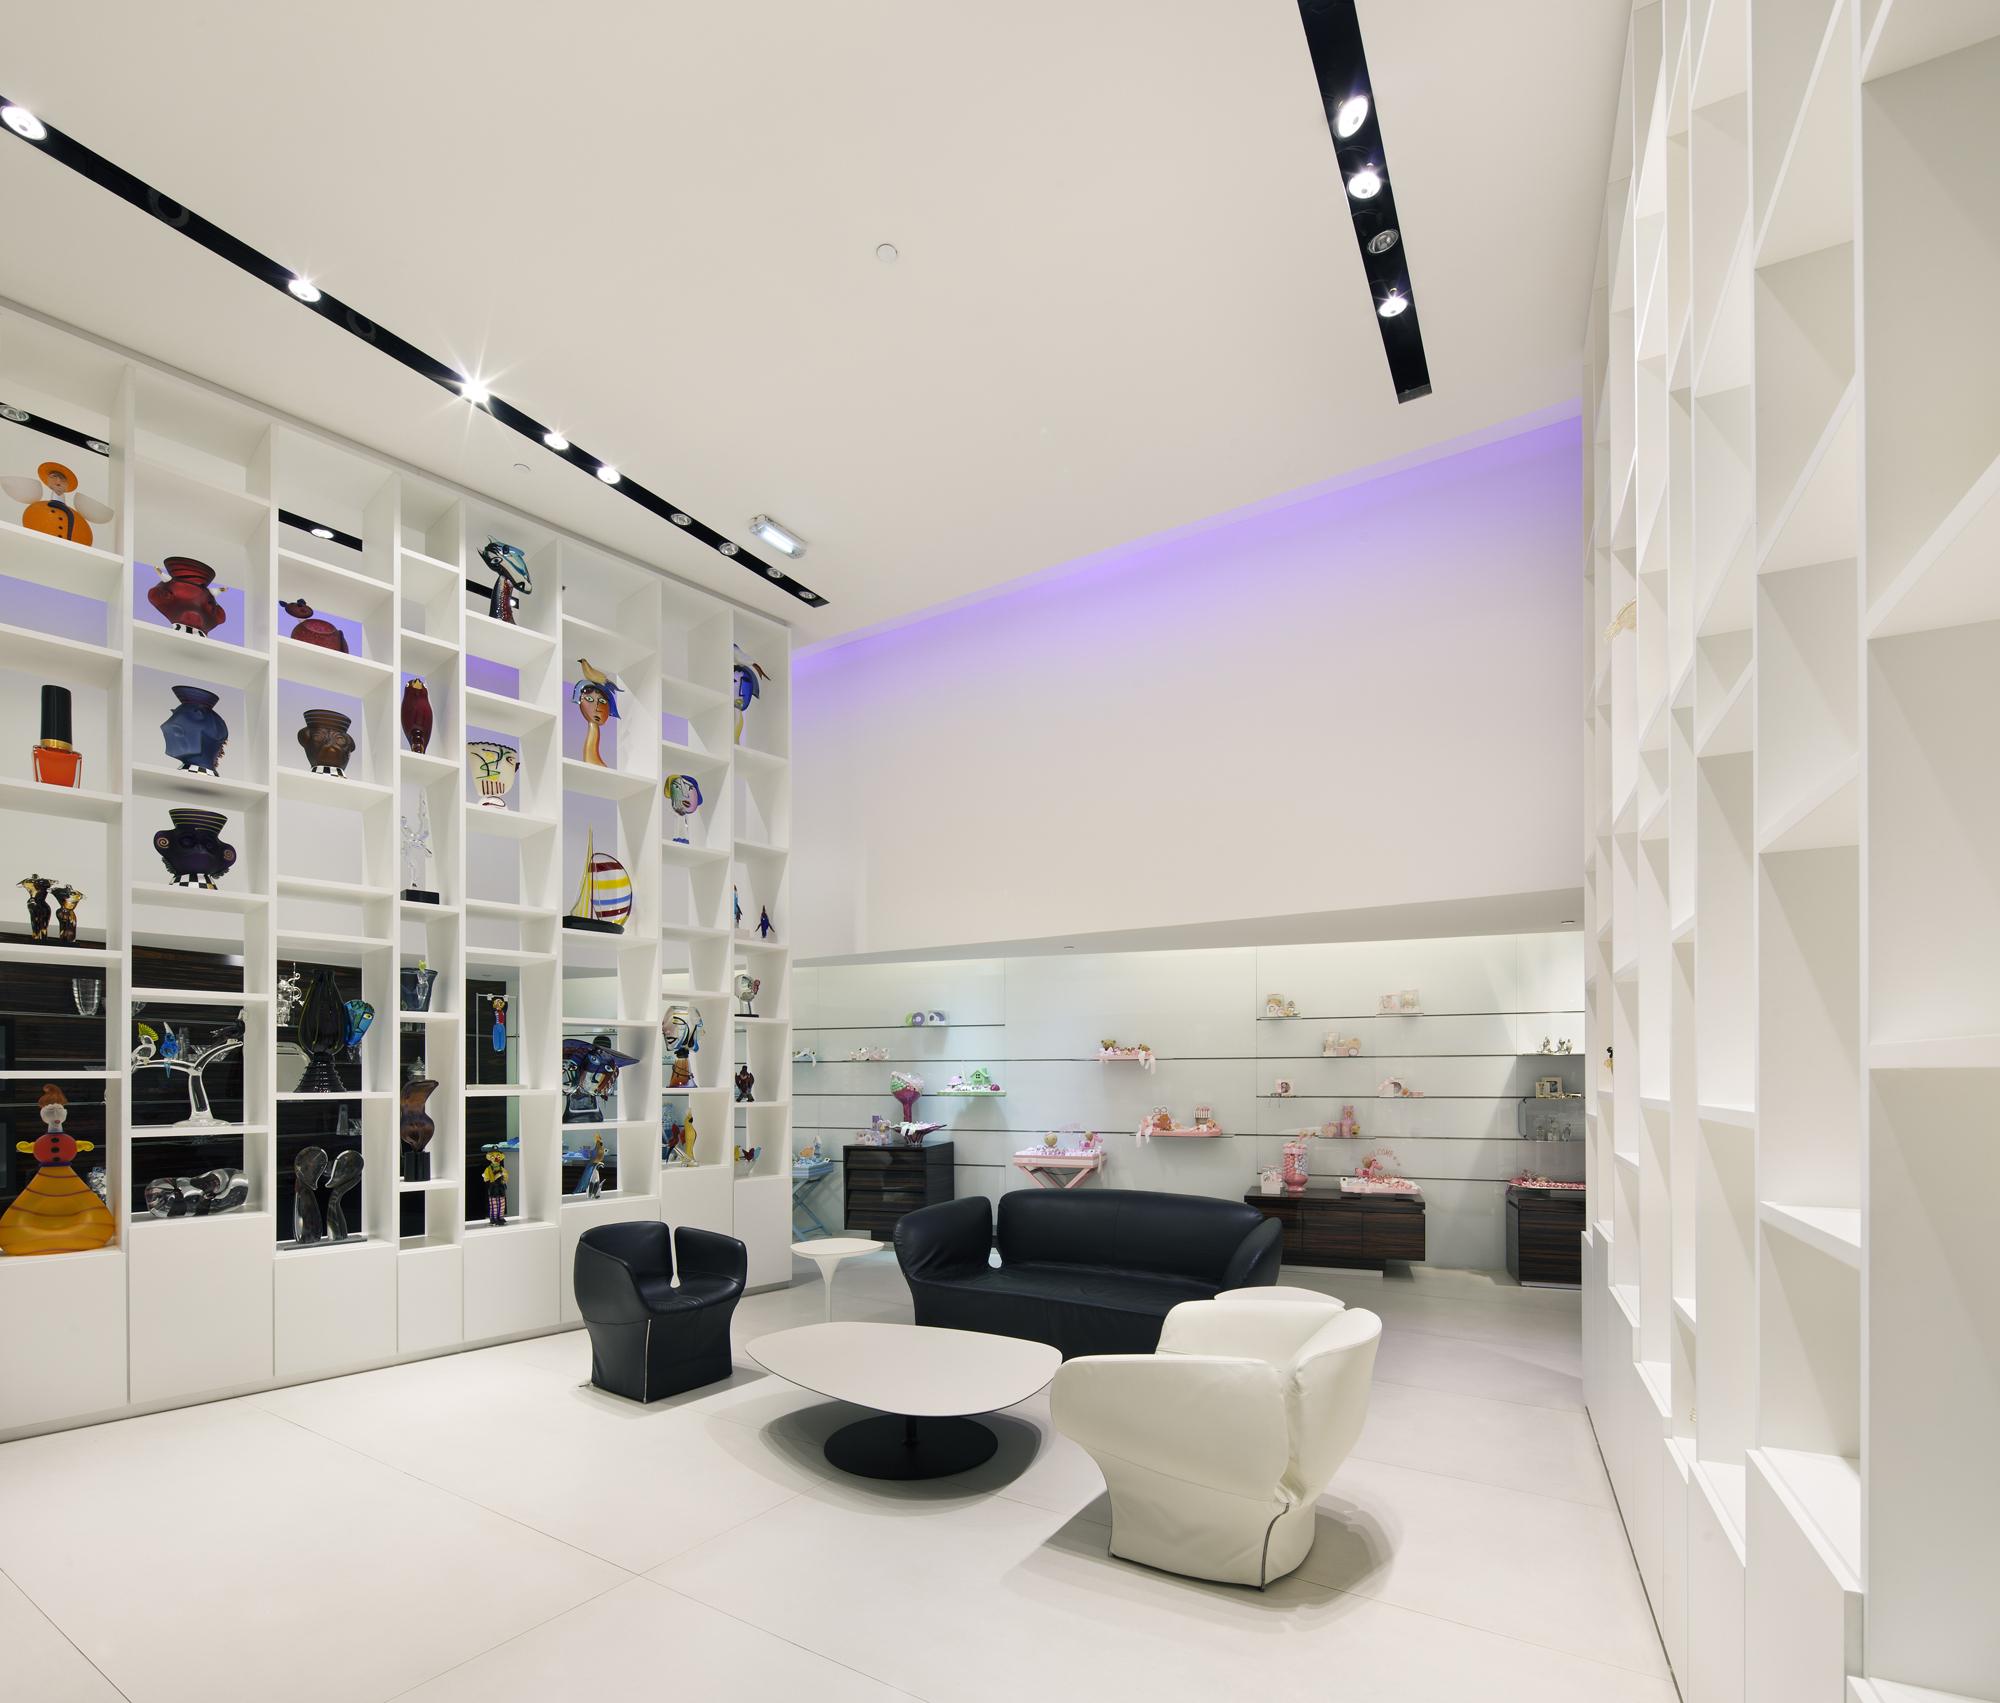 Patchi store hkz mena design magazine for Dubai fashions home decorations